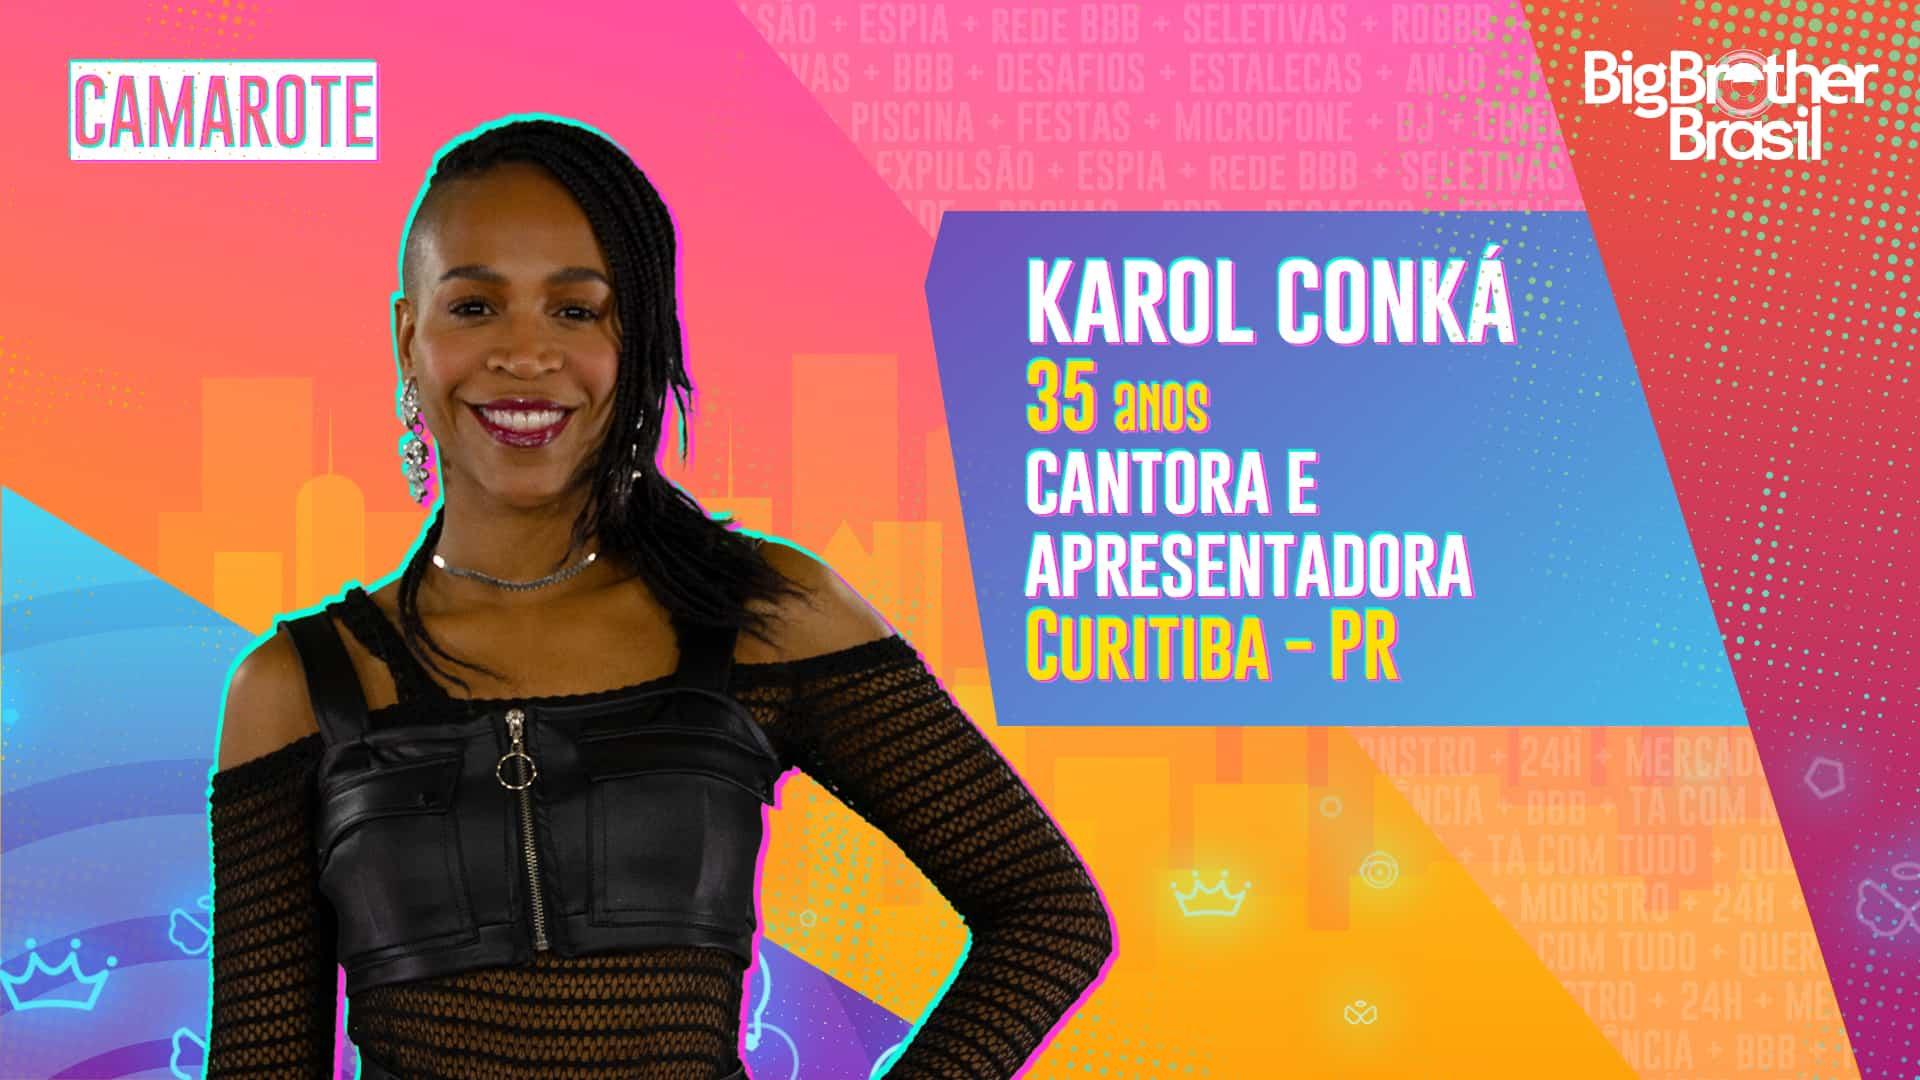 karol conka bbb21